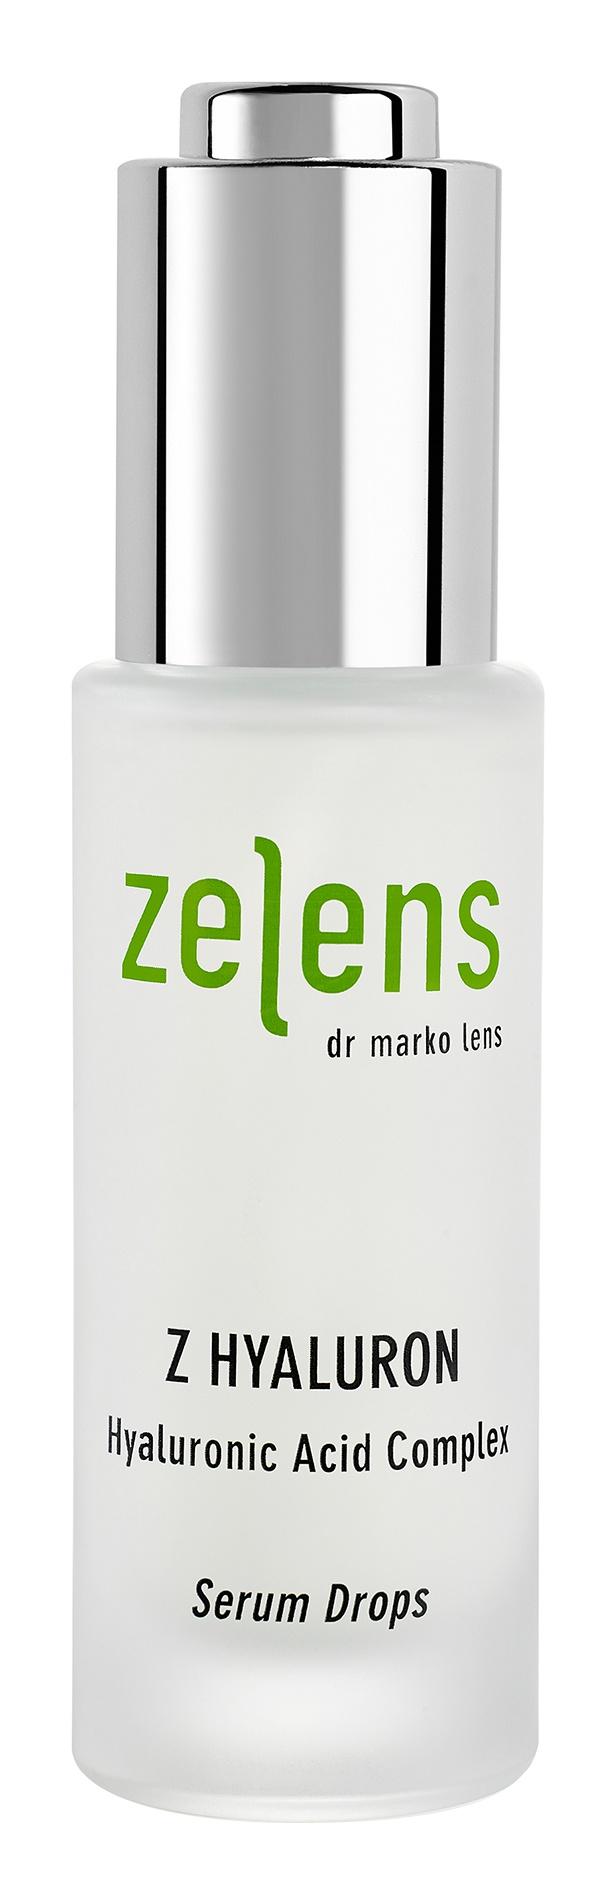 Zelens Hyaluron Hyaluronic Acid Complex Serum Drops